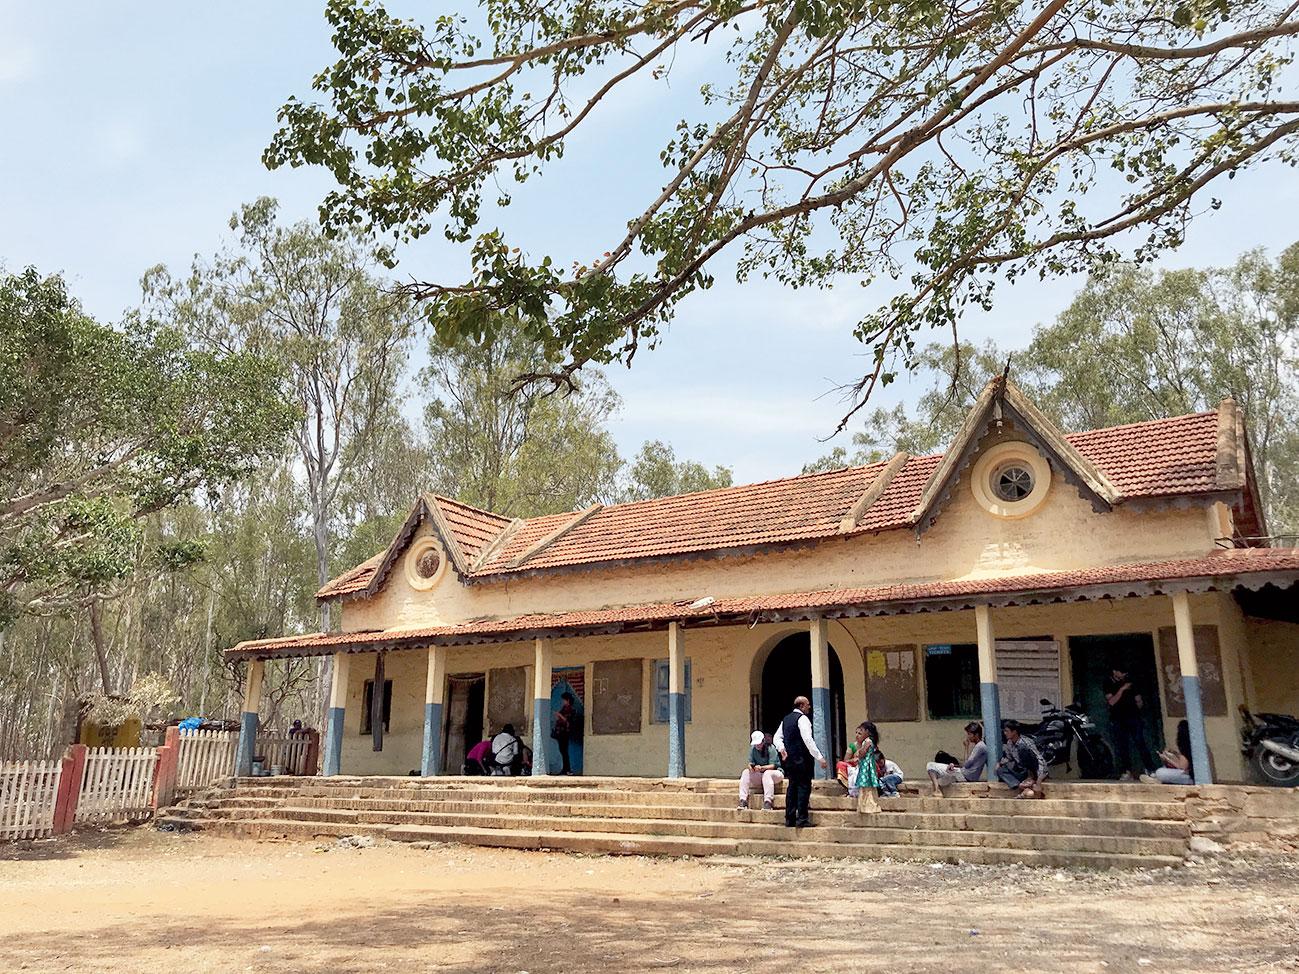 The Nandi railway station